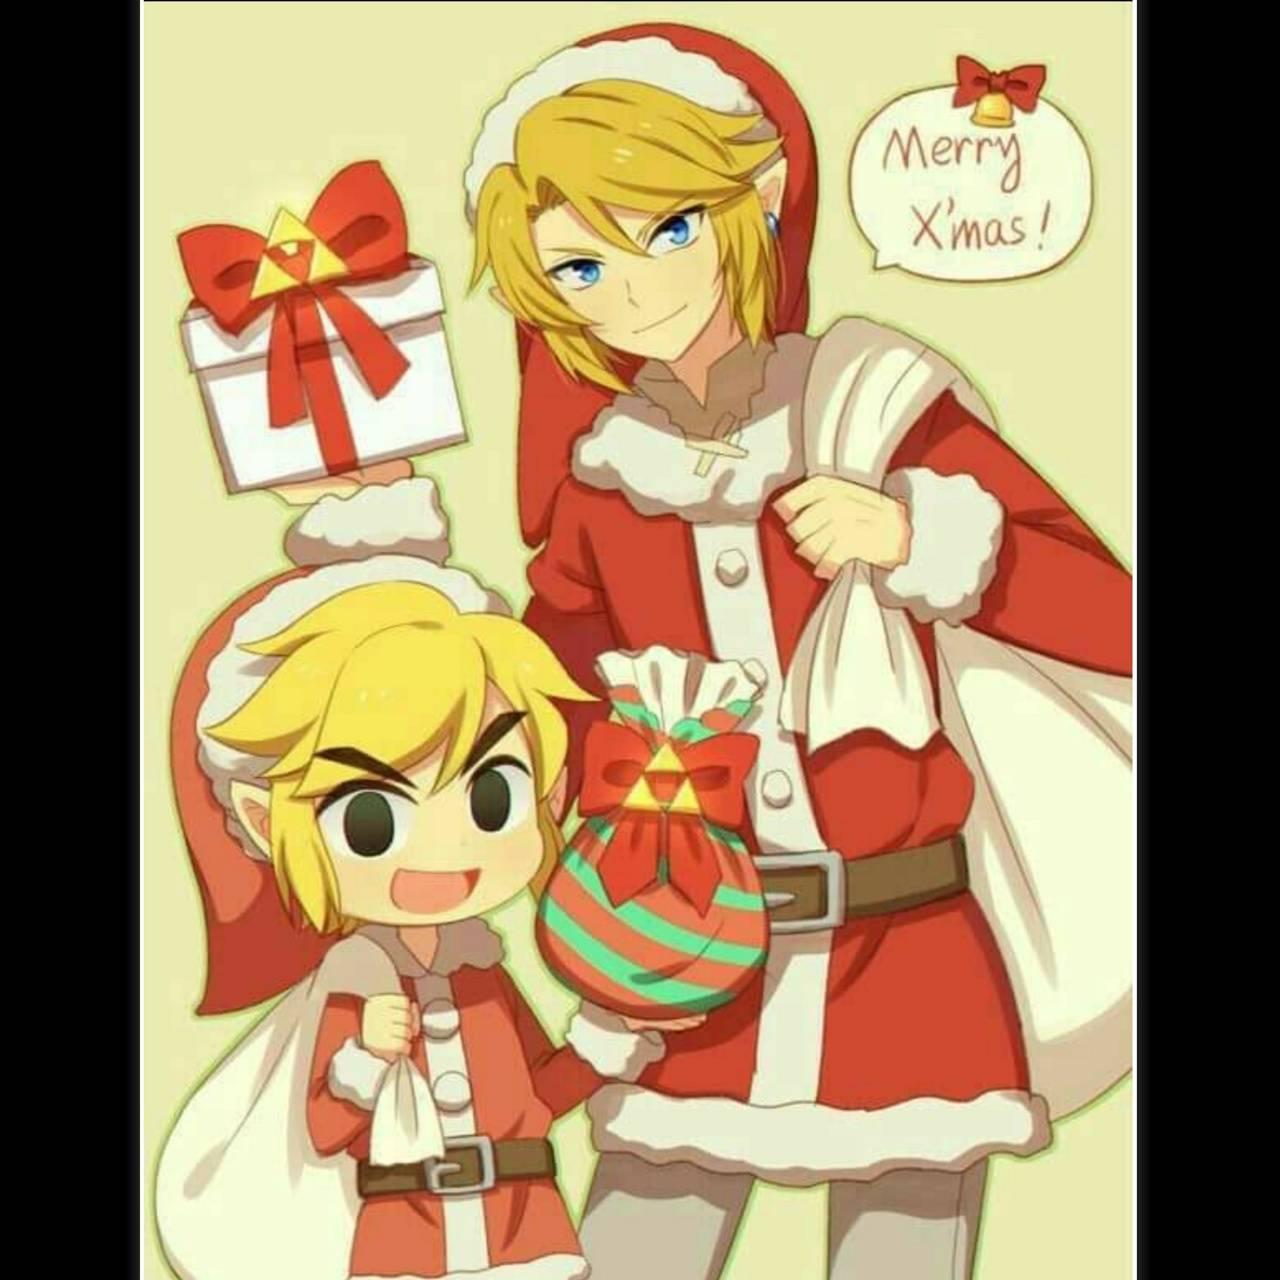 A Link to Christmas